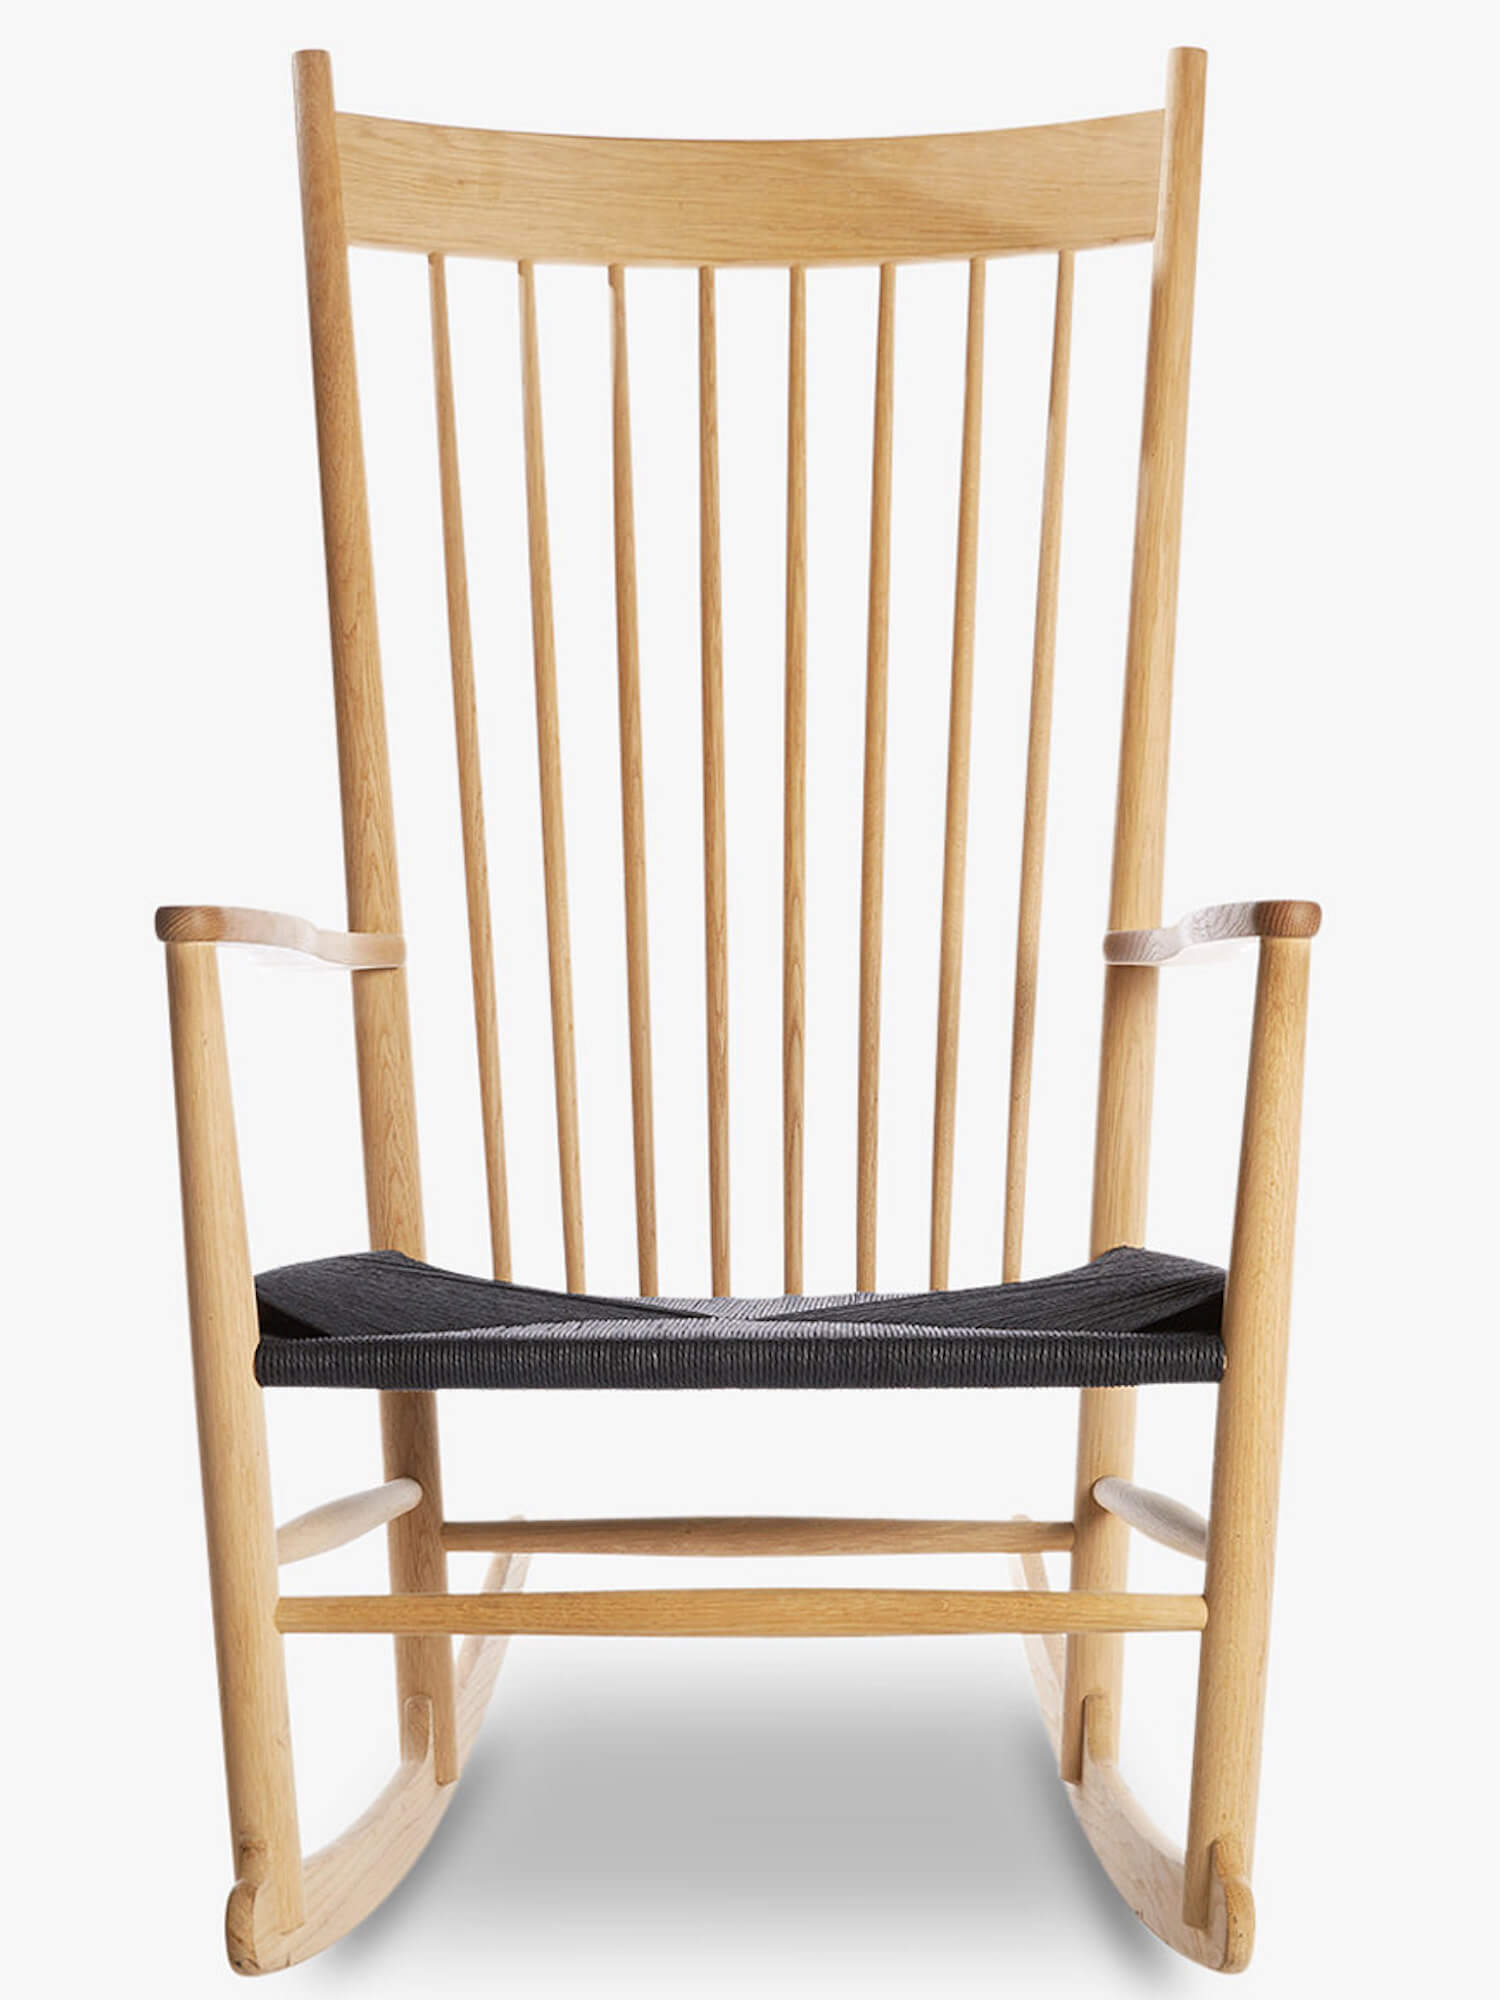 est living the est edit rocking chairs j16 rocking chair great dane 1